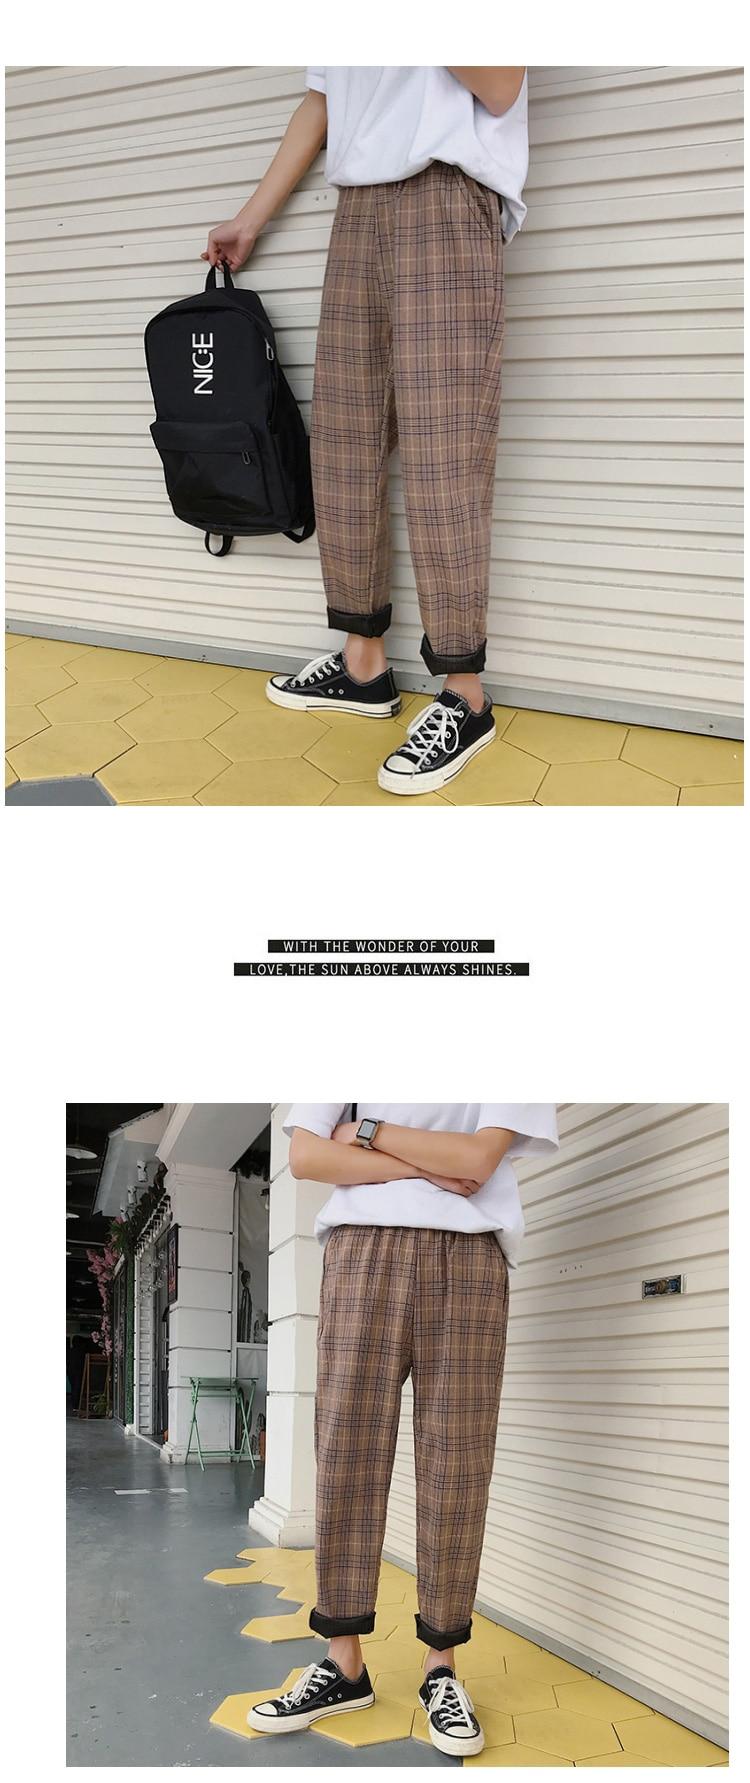 LAPPSTER Streetwear Yellow Plaid Pants Men Joggers 19 Man Casual Straight Harem Pants Men Korean Hip Hop Track Pants Plus Size 27